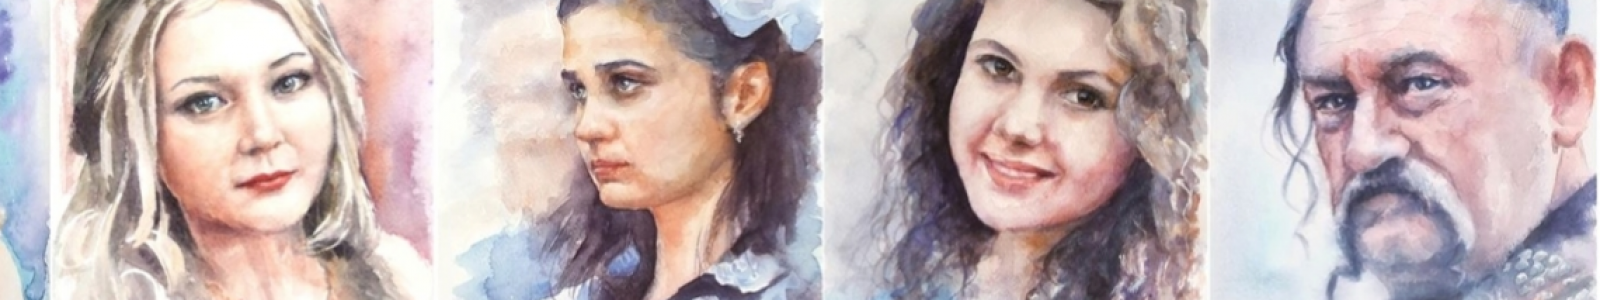 Gallery Painter Viktor Artamonov